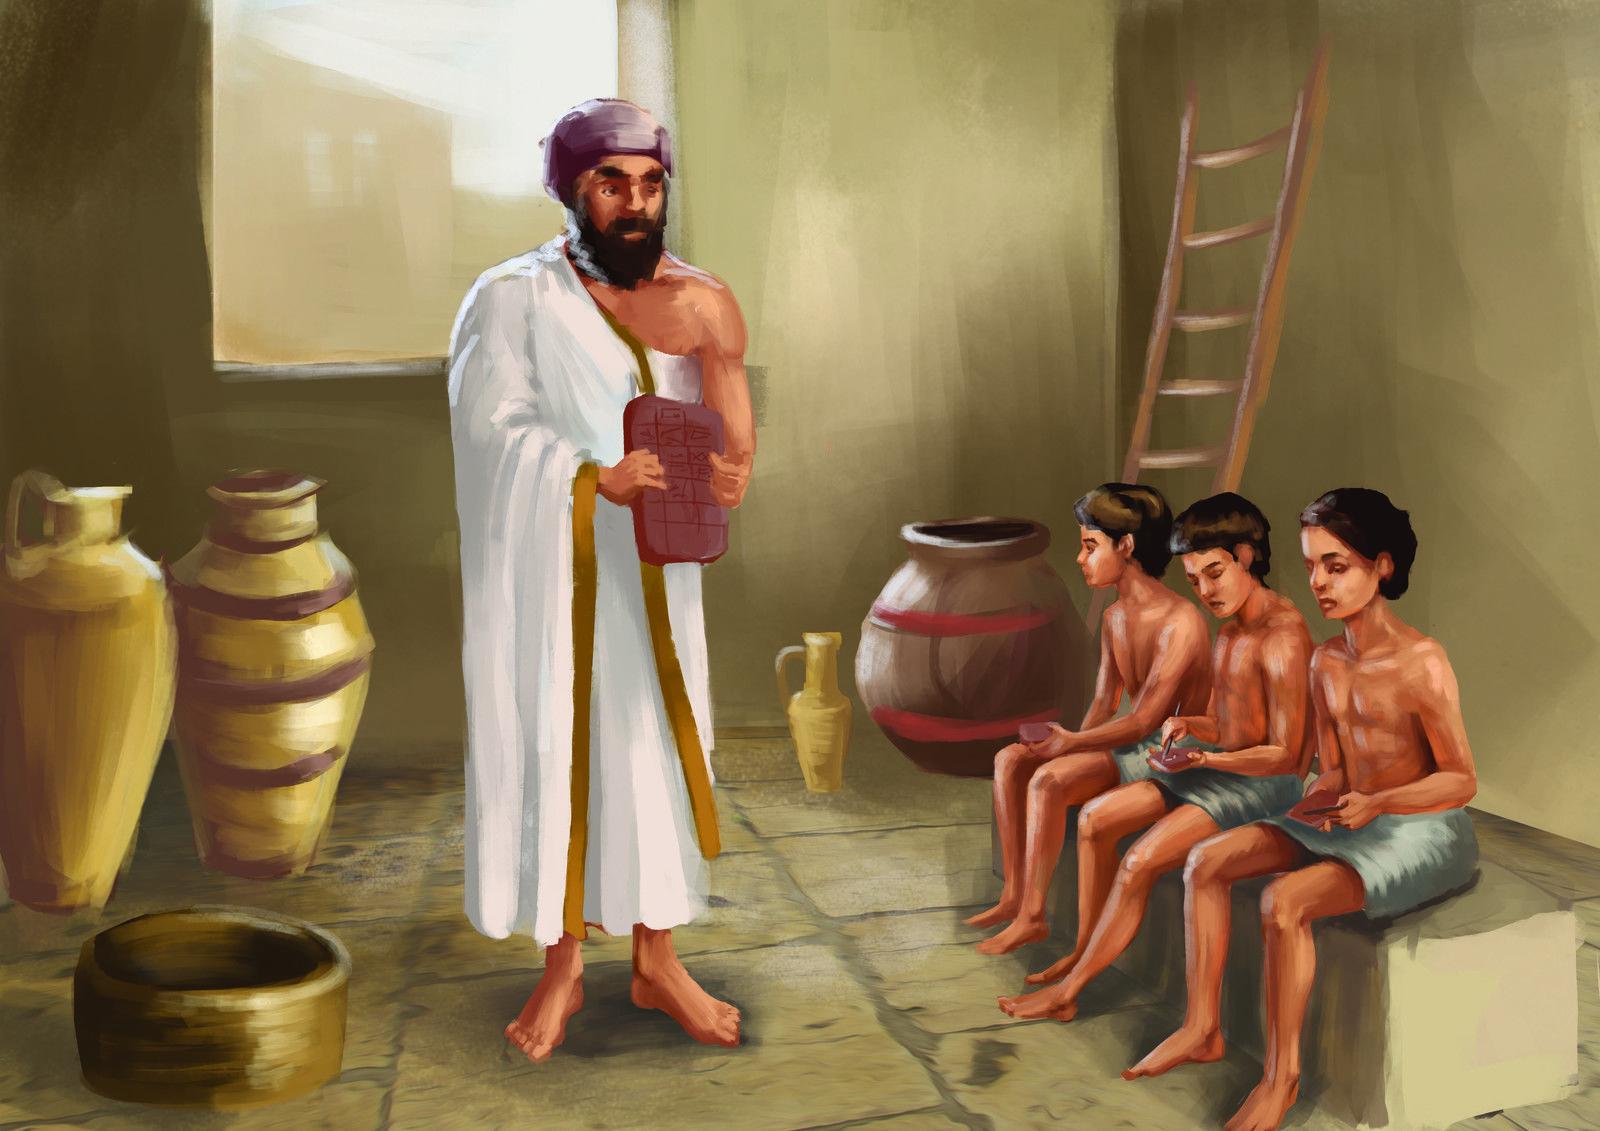 Ancient mesopotamian school by gabriela shelkalina on